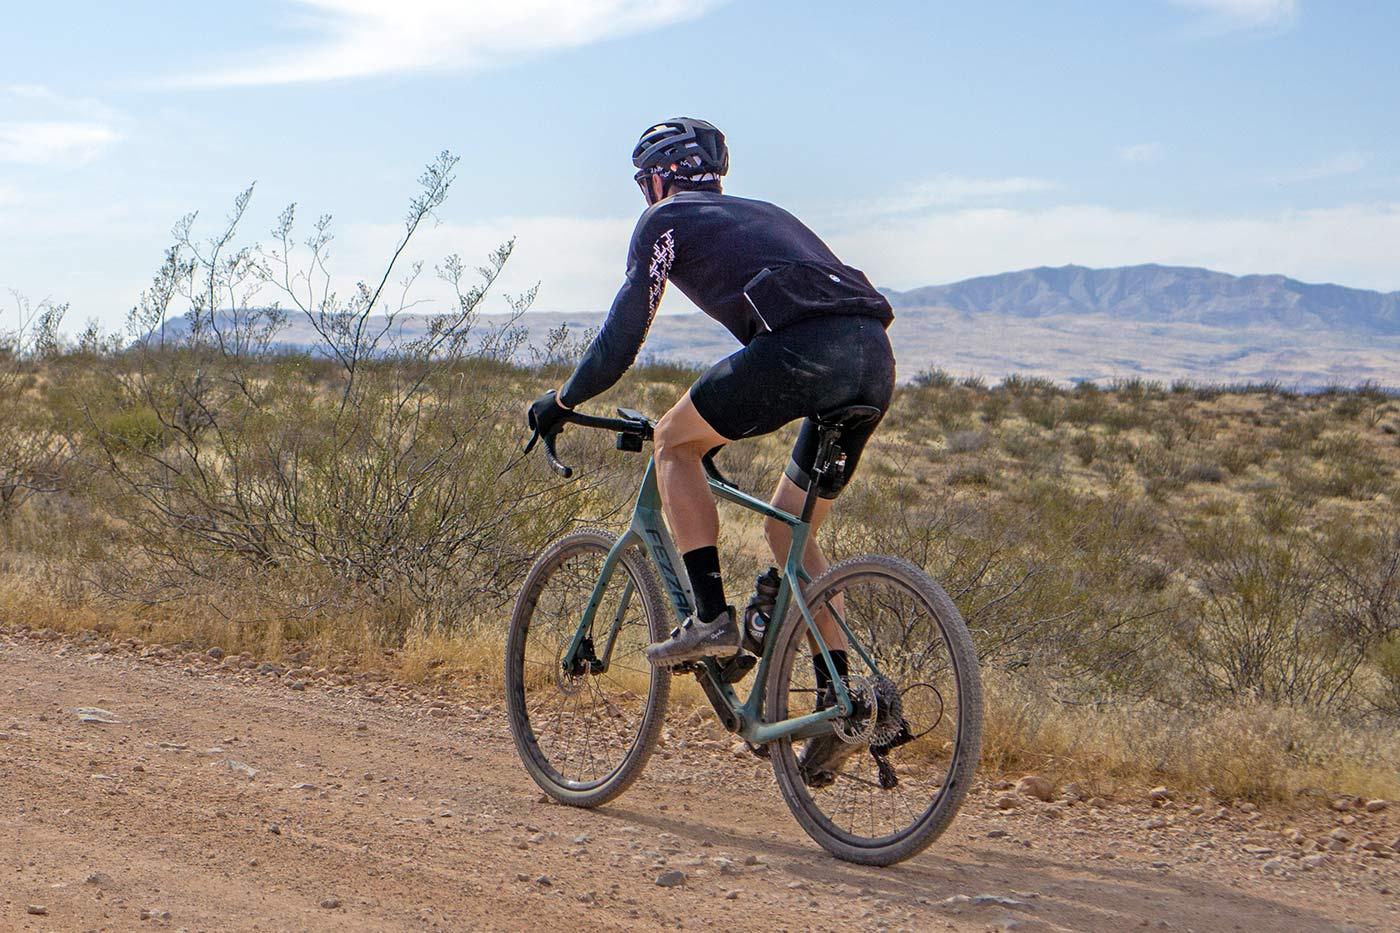 fezzari shafer gravel bike being ridden on a dirt road